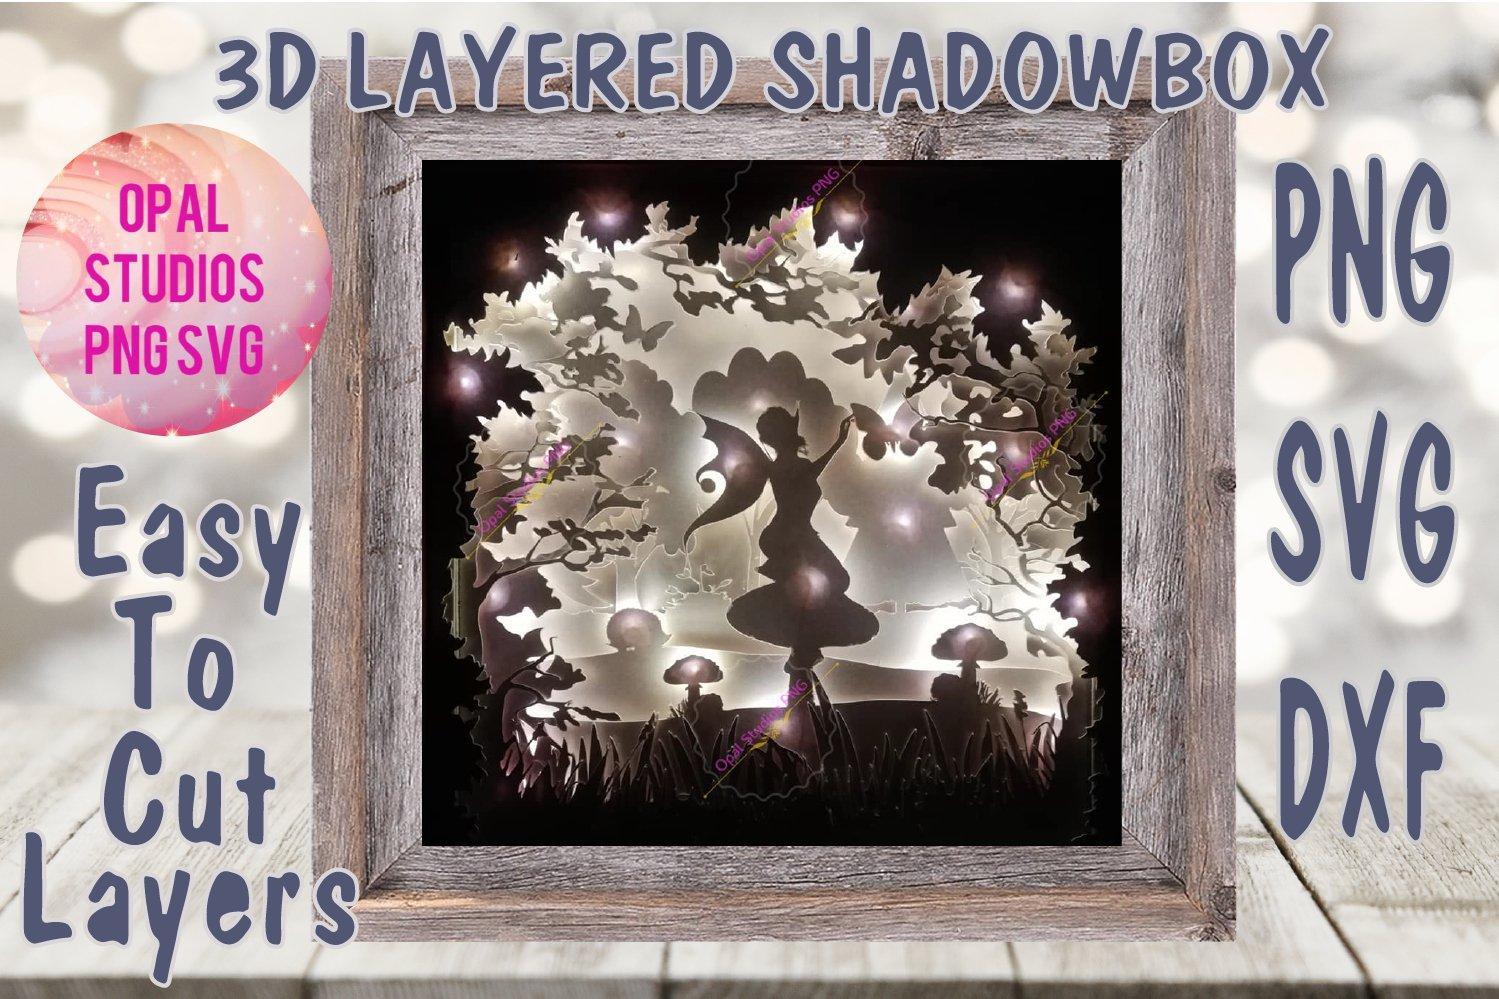 fairy fantasy mystical woodland pretty scenery pretty girly papercutting 3d shadowbox shadow box light SVG PNG DXF digital Cricut Personal